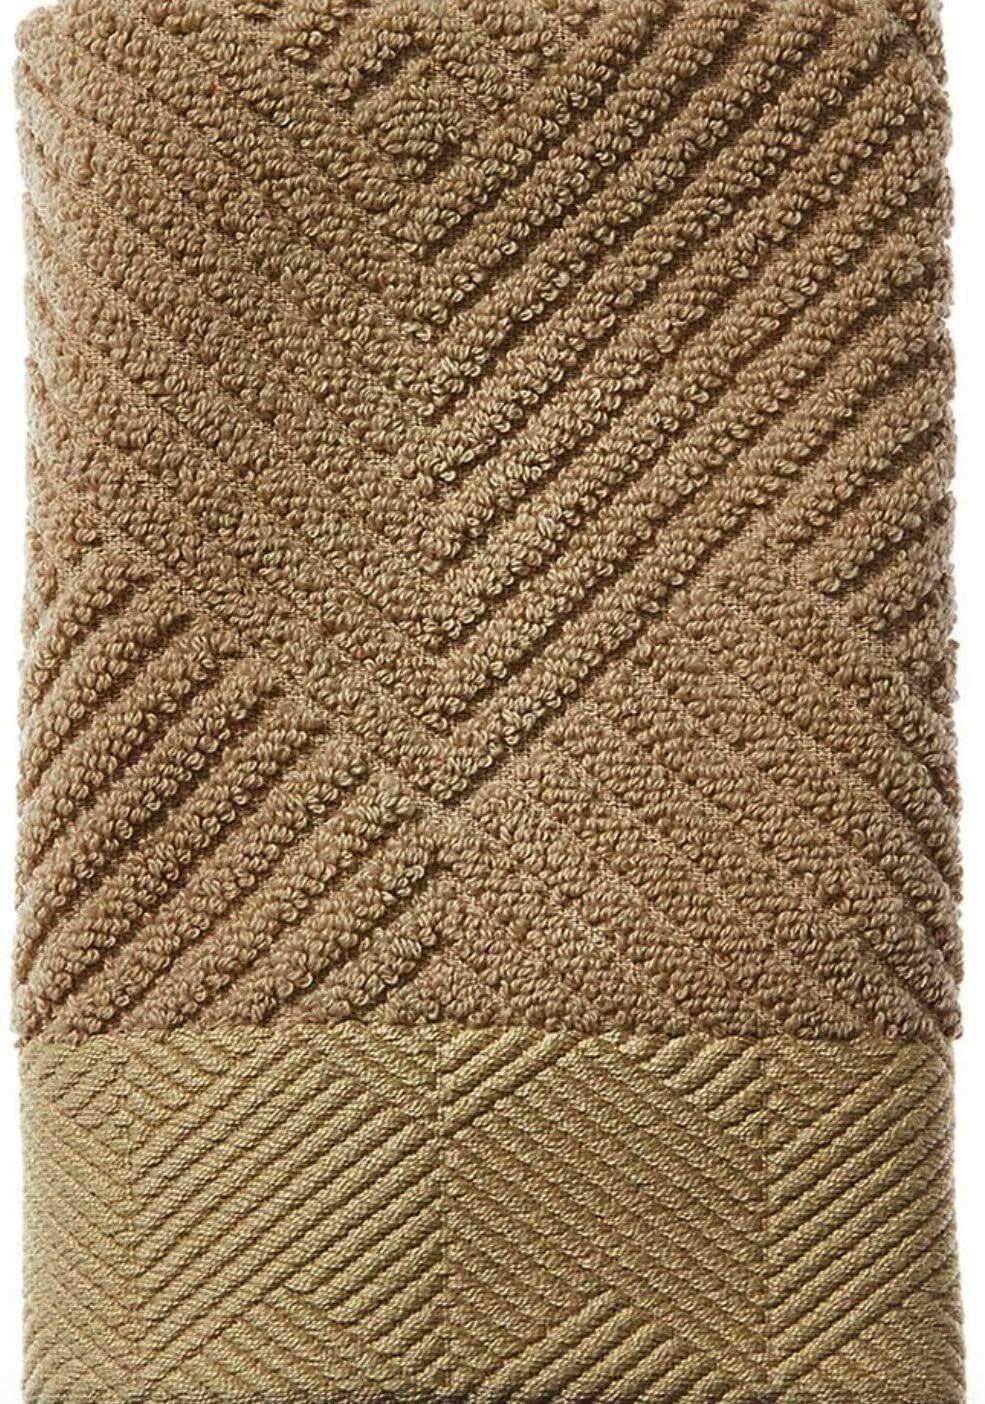 NWT FRETTE 100% Egyptian Cotton Diamond Jacquard Hand Towel in Kaki Portugal